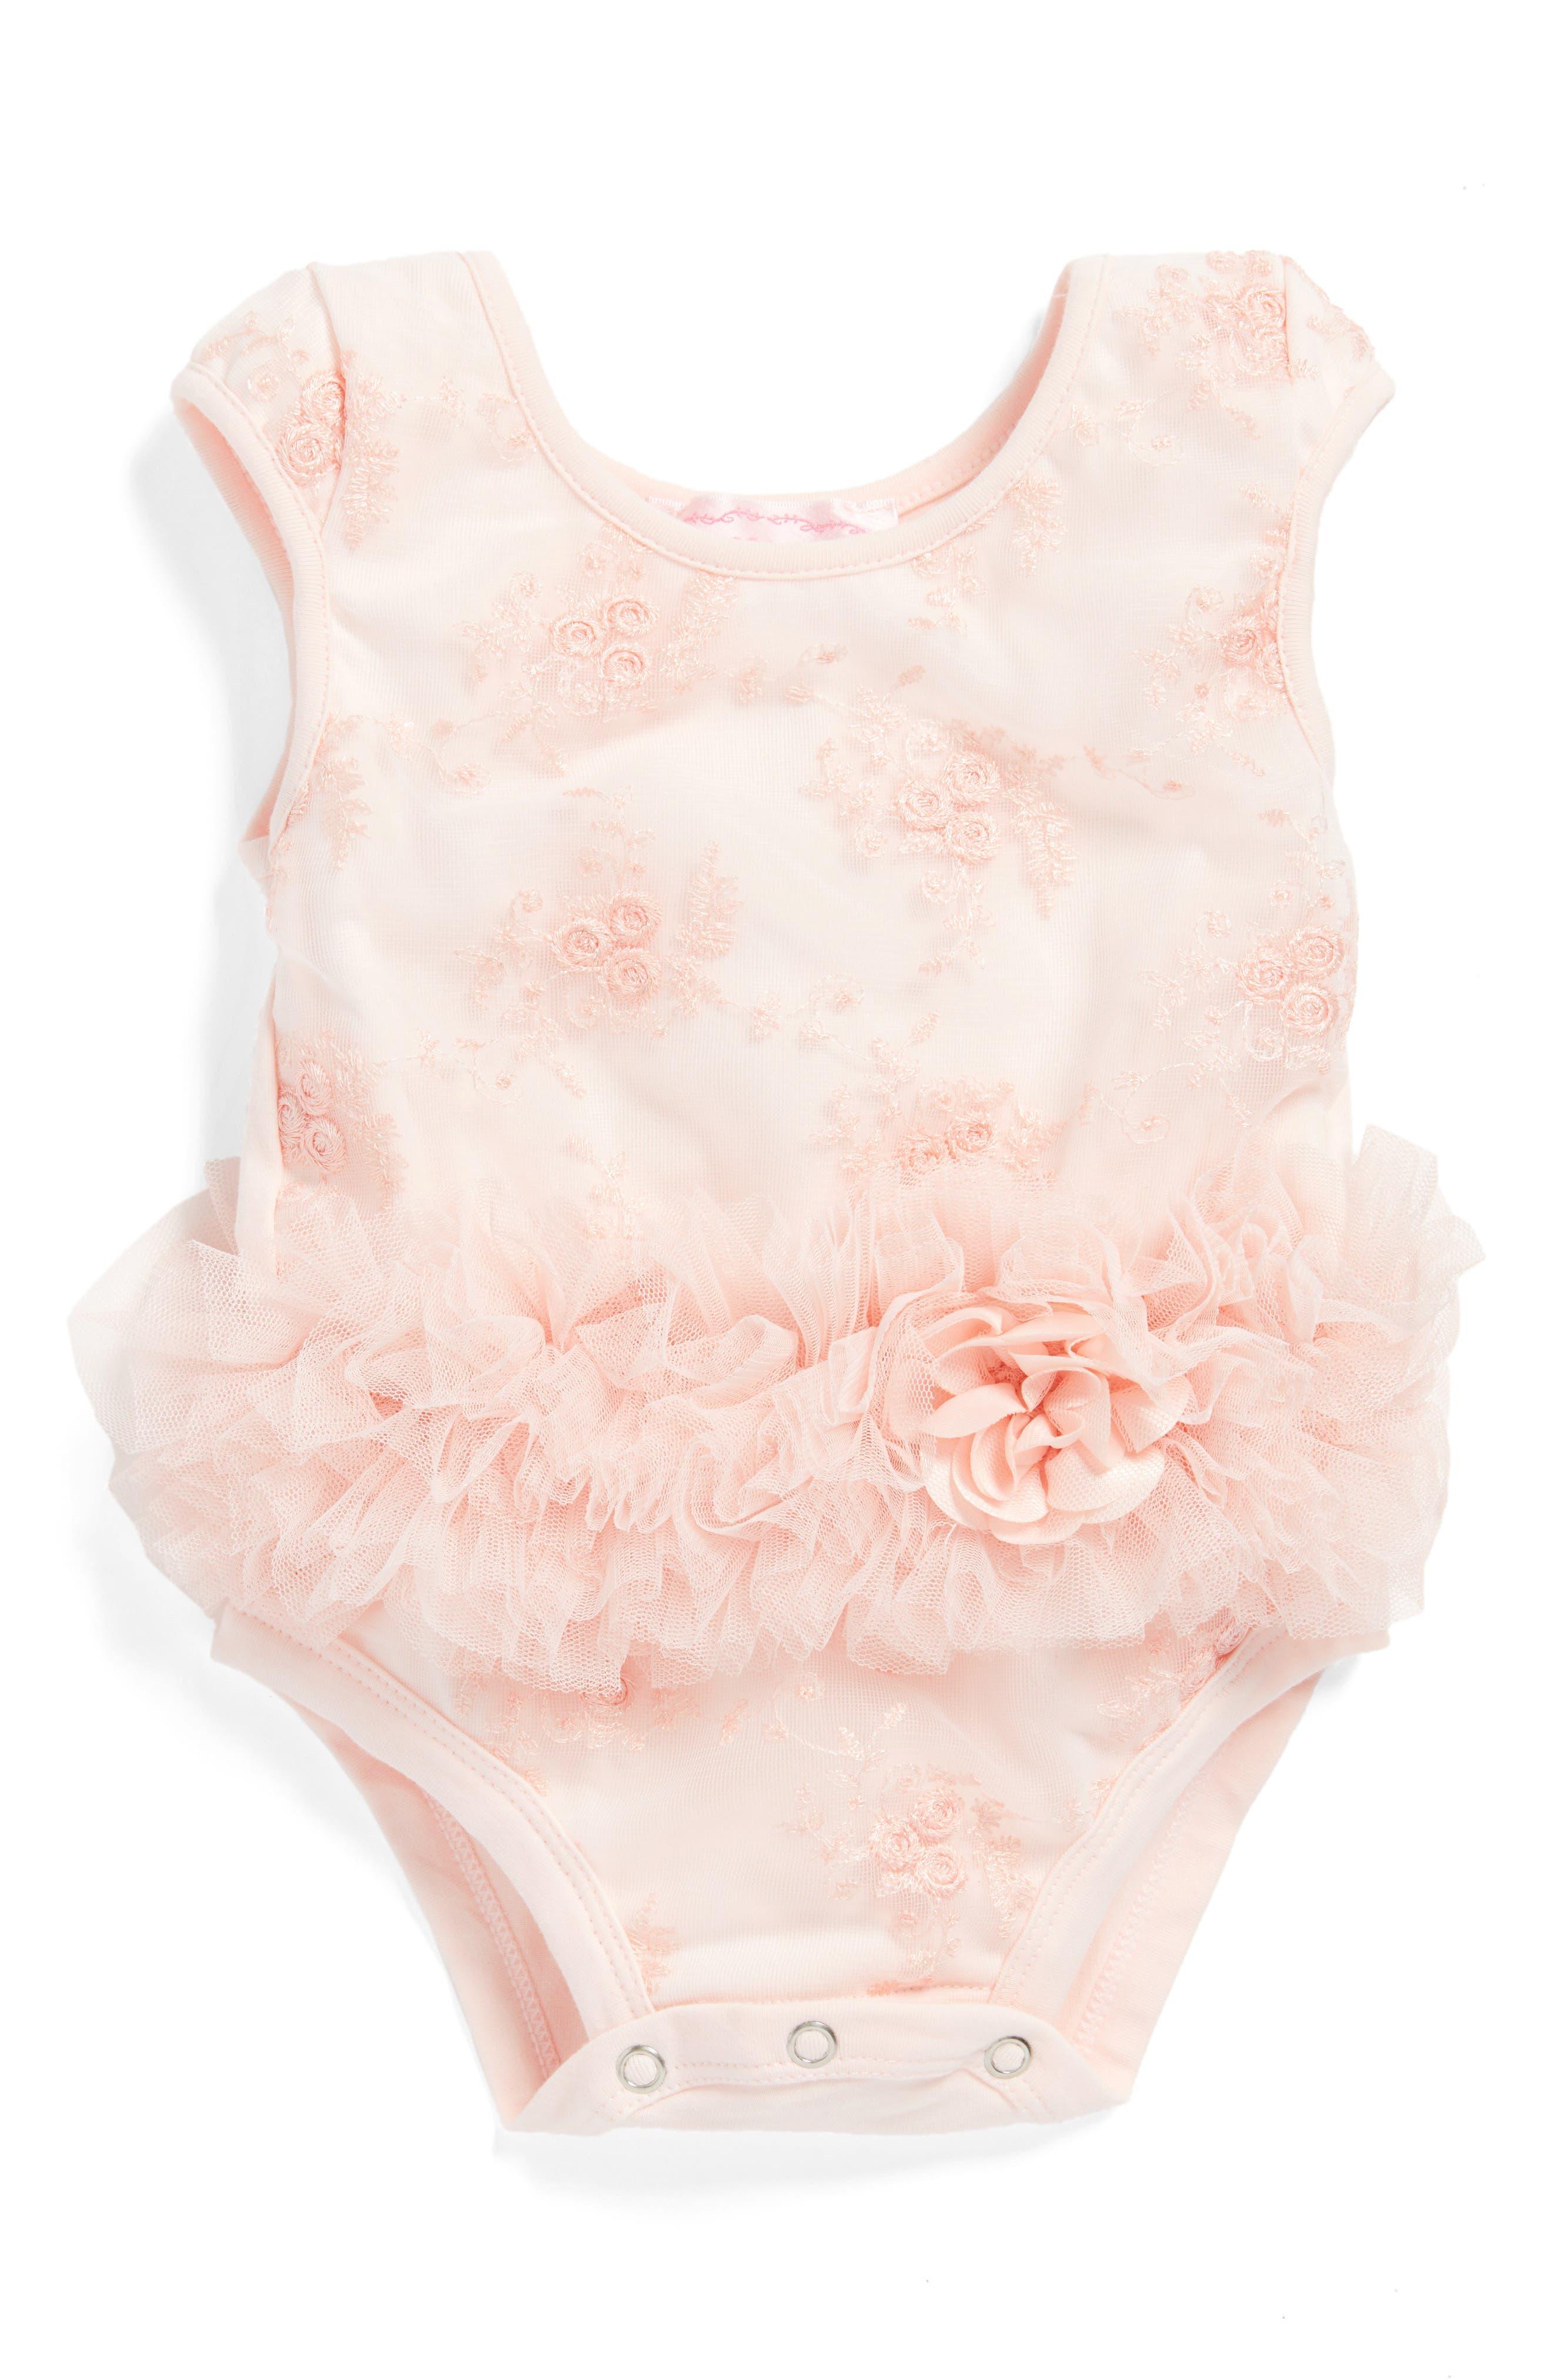 Peach Flower Tutu Bodysuit,                             Main thumbnail 1, color,                             950